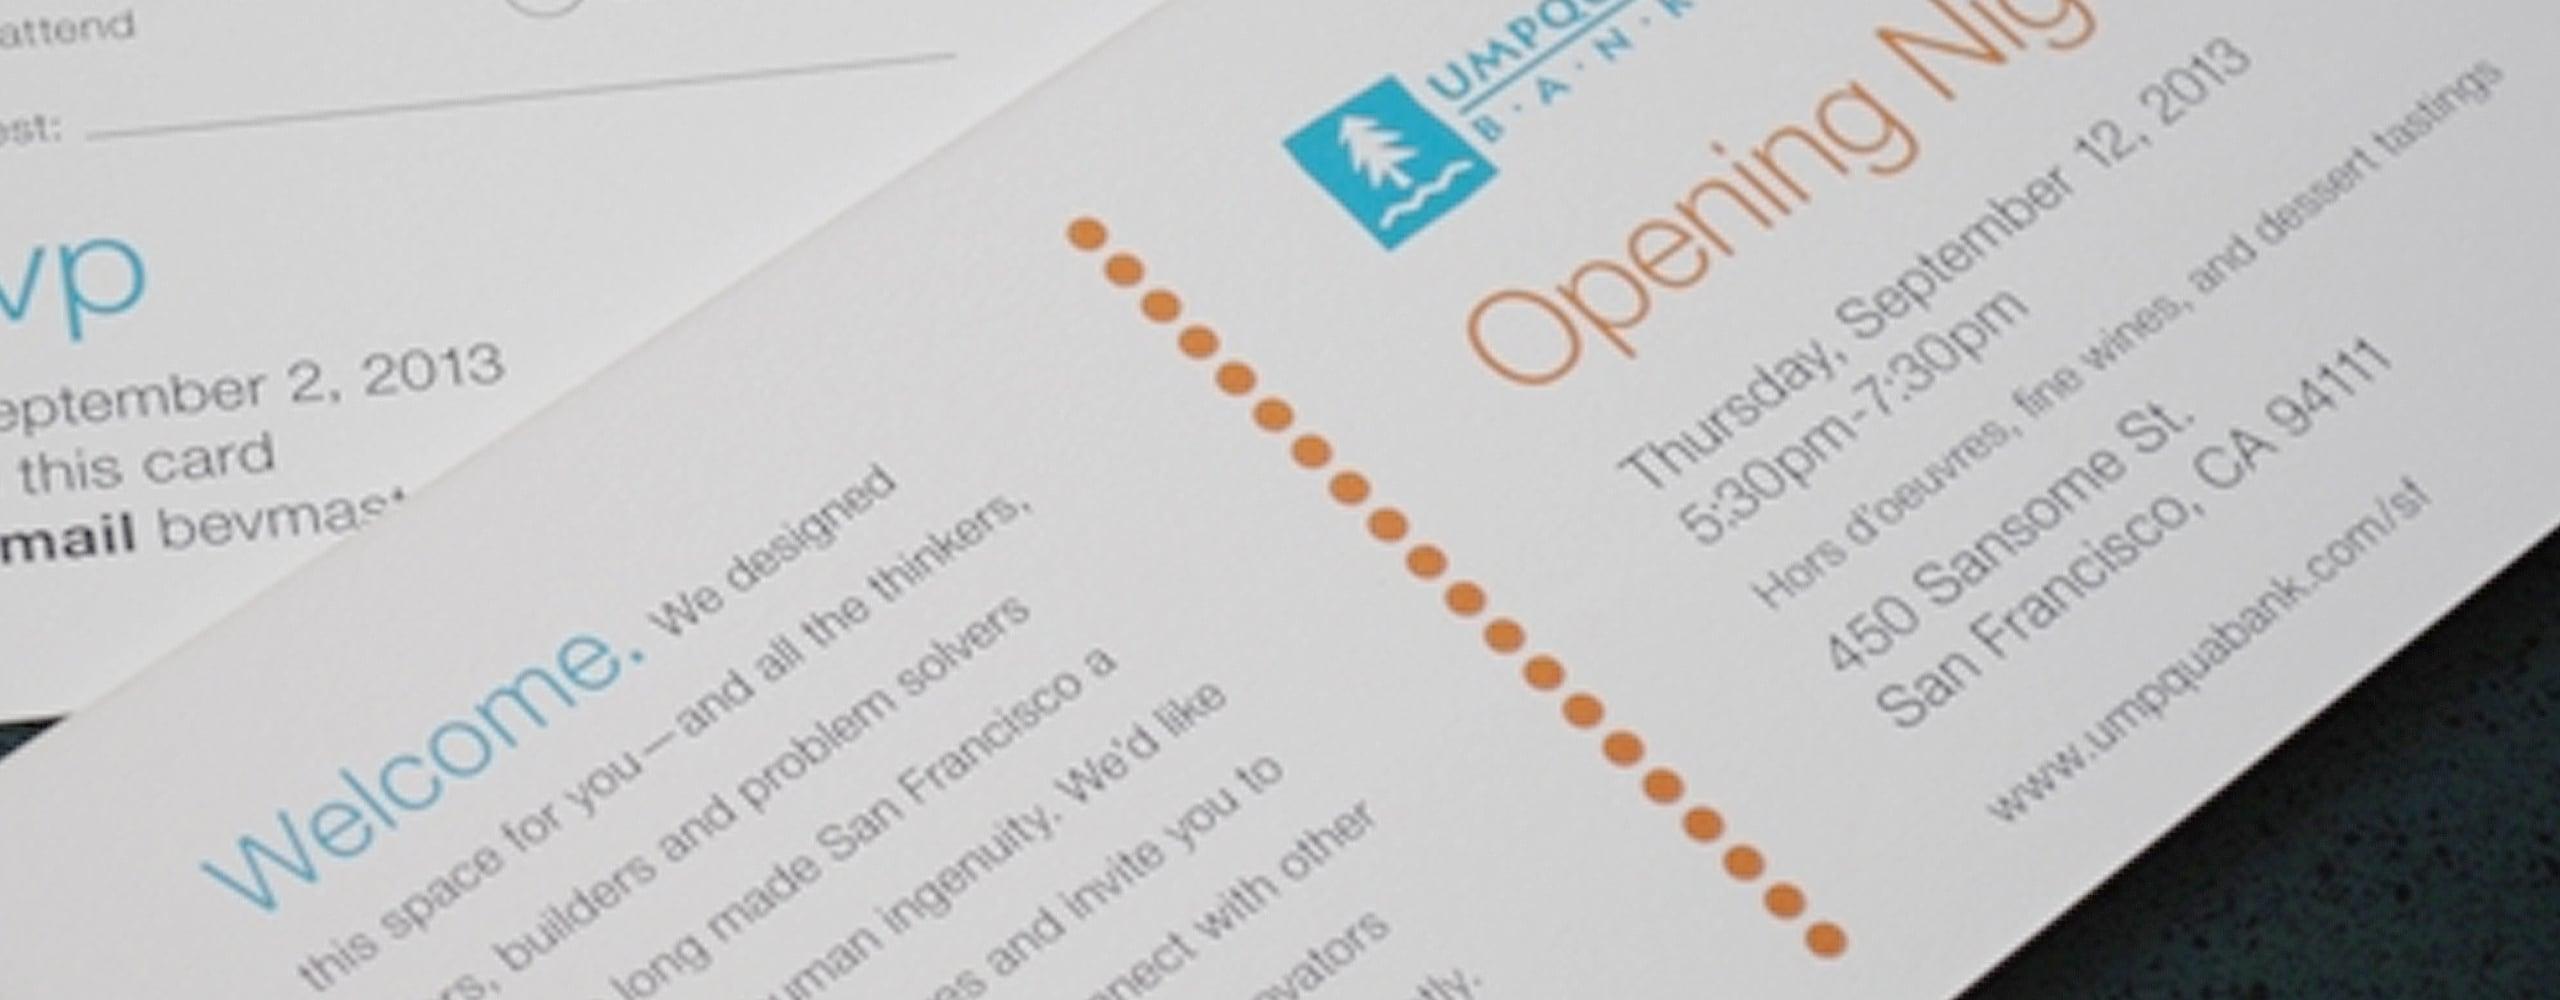 Banner for Umpqua Bank Opening Night Invitation marketing materials